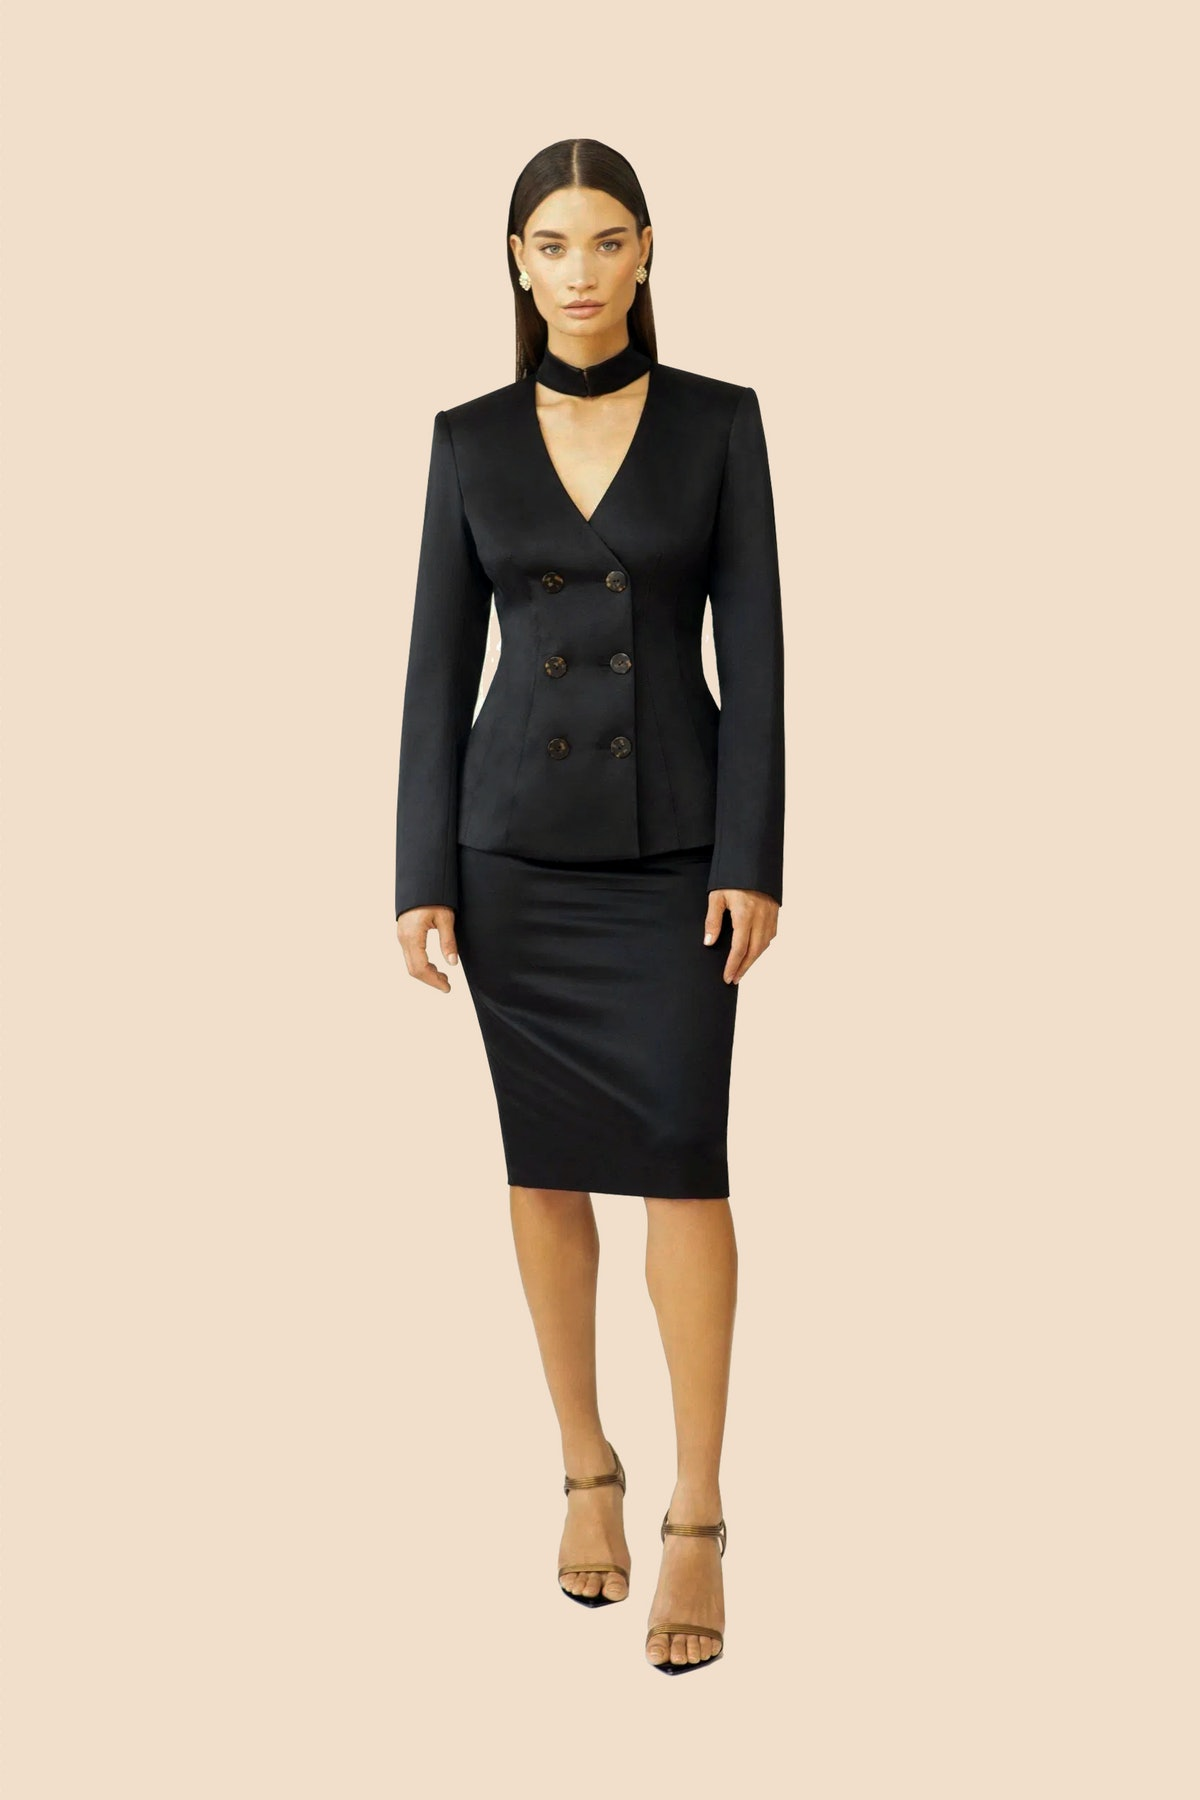 Silk Wool Double Breasted Choker Jacket